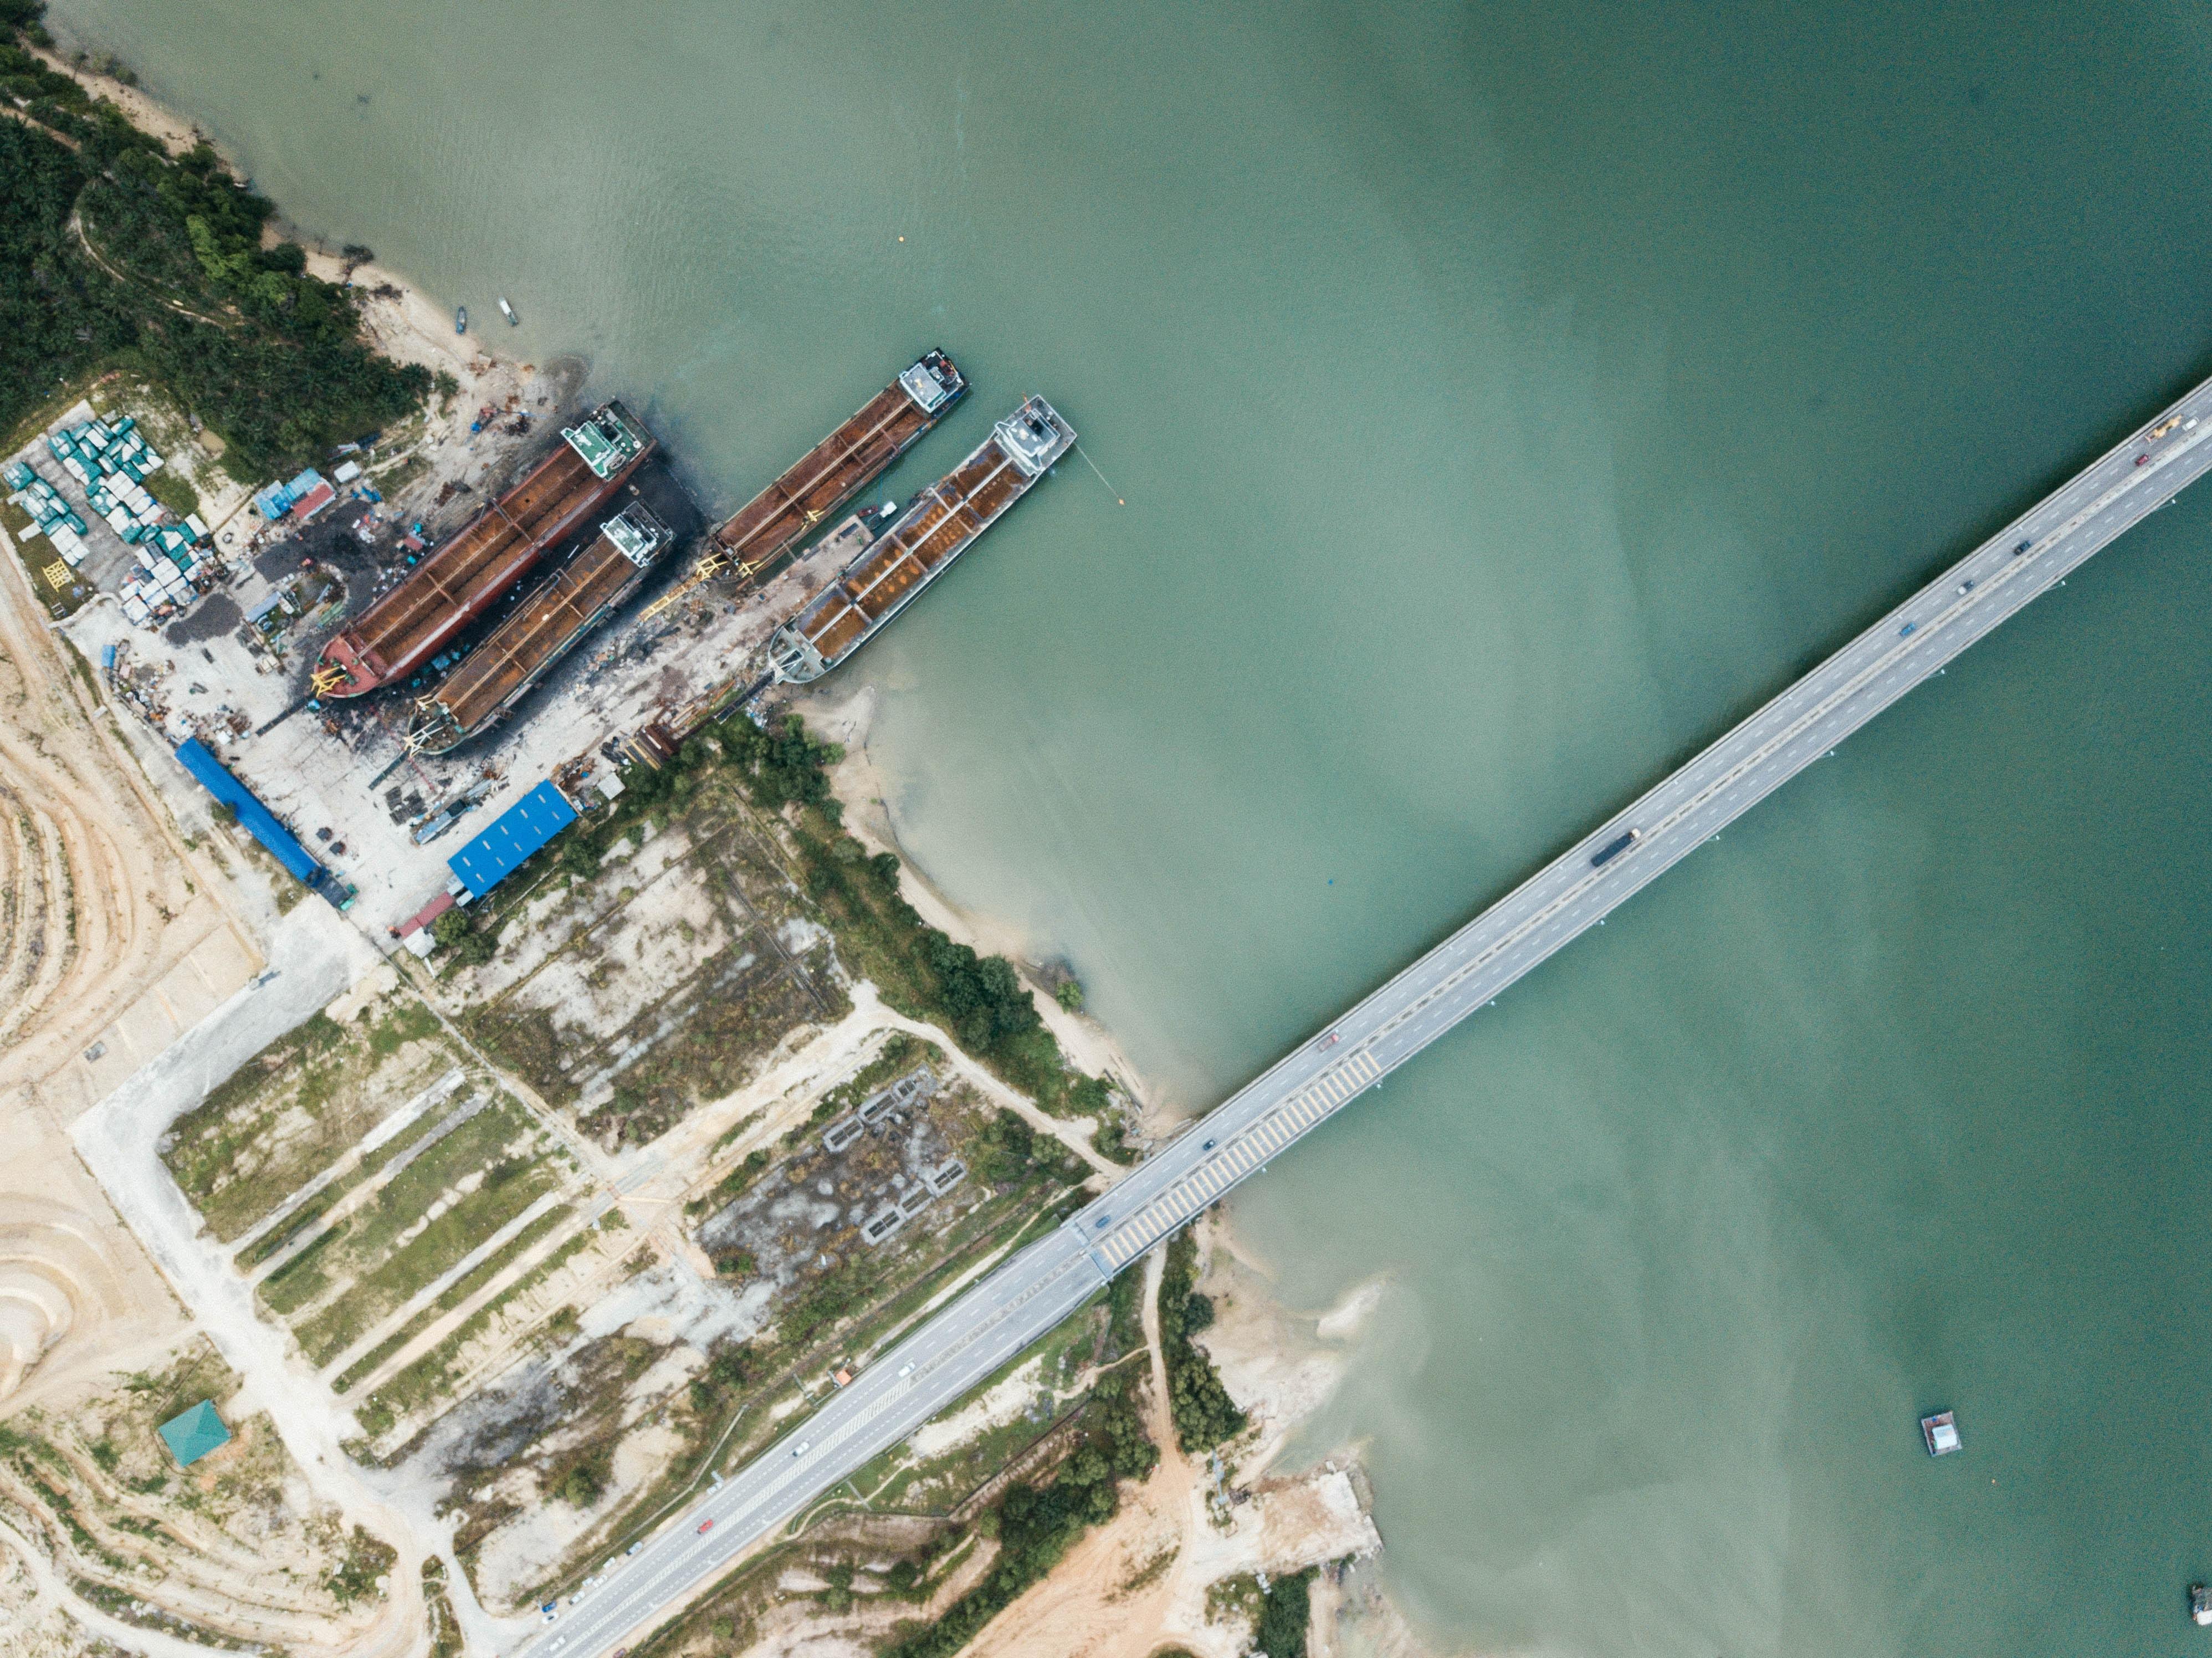 aerial photo of bridge and buildings